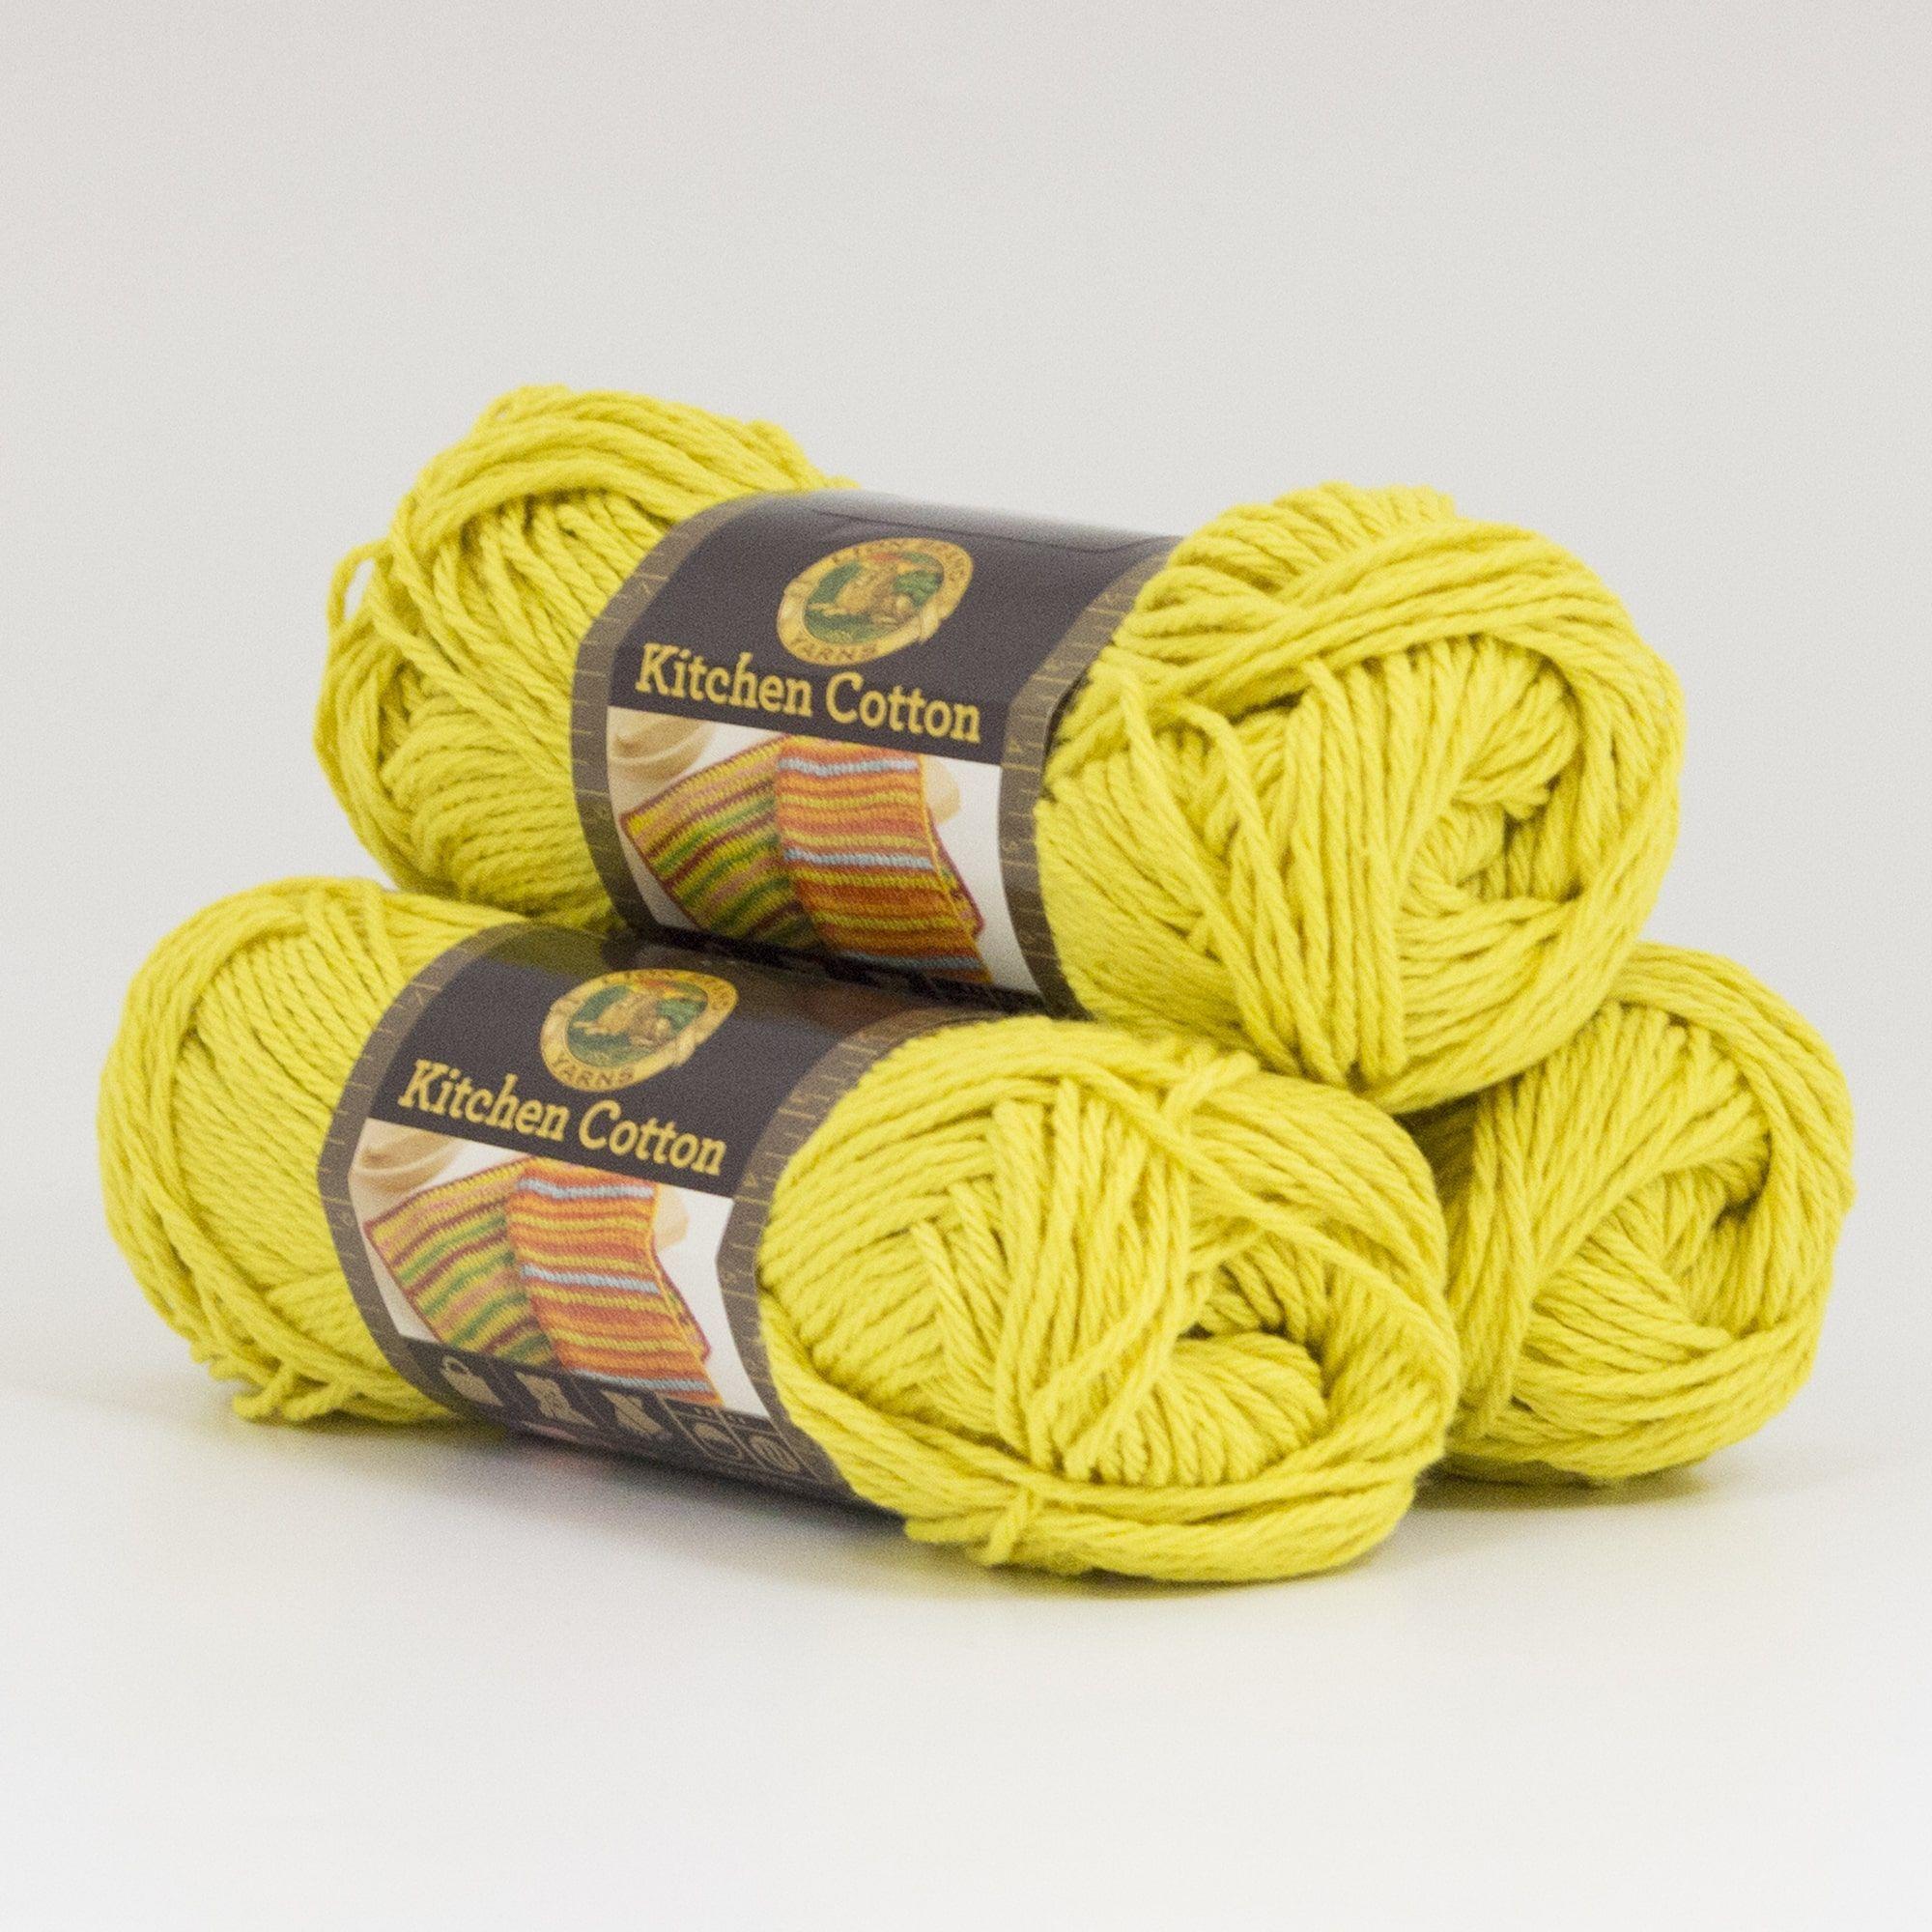 Lion Brand Yarn Kitchen Cotton Citrus 831 157 3 Pack Clic